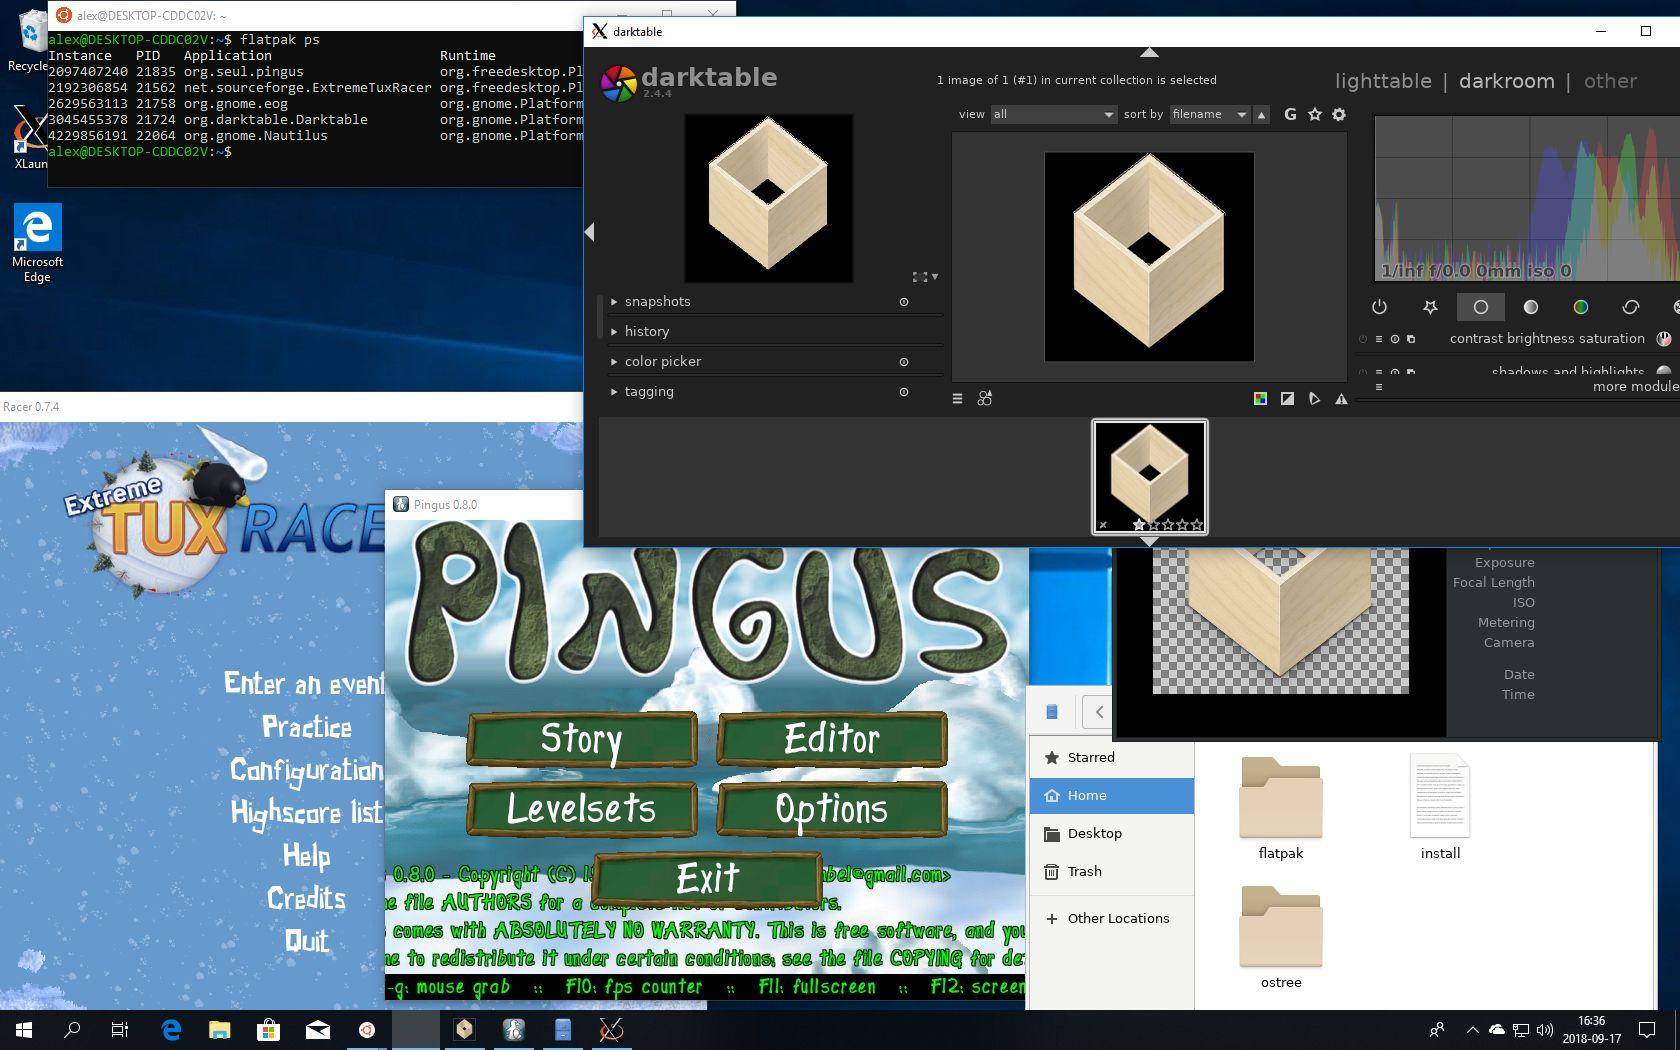 [Flatpak-Linux]Bedlam version download